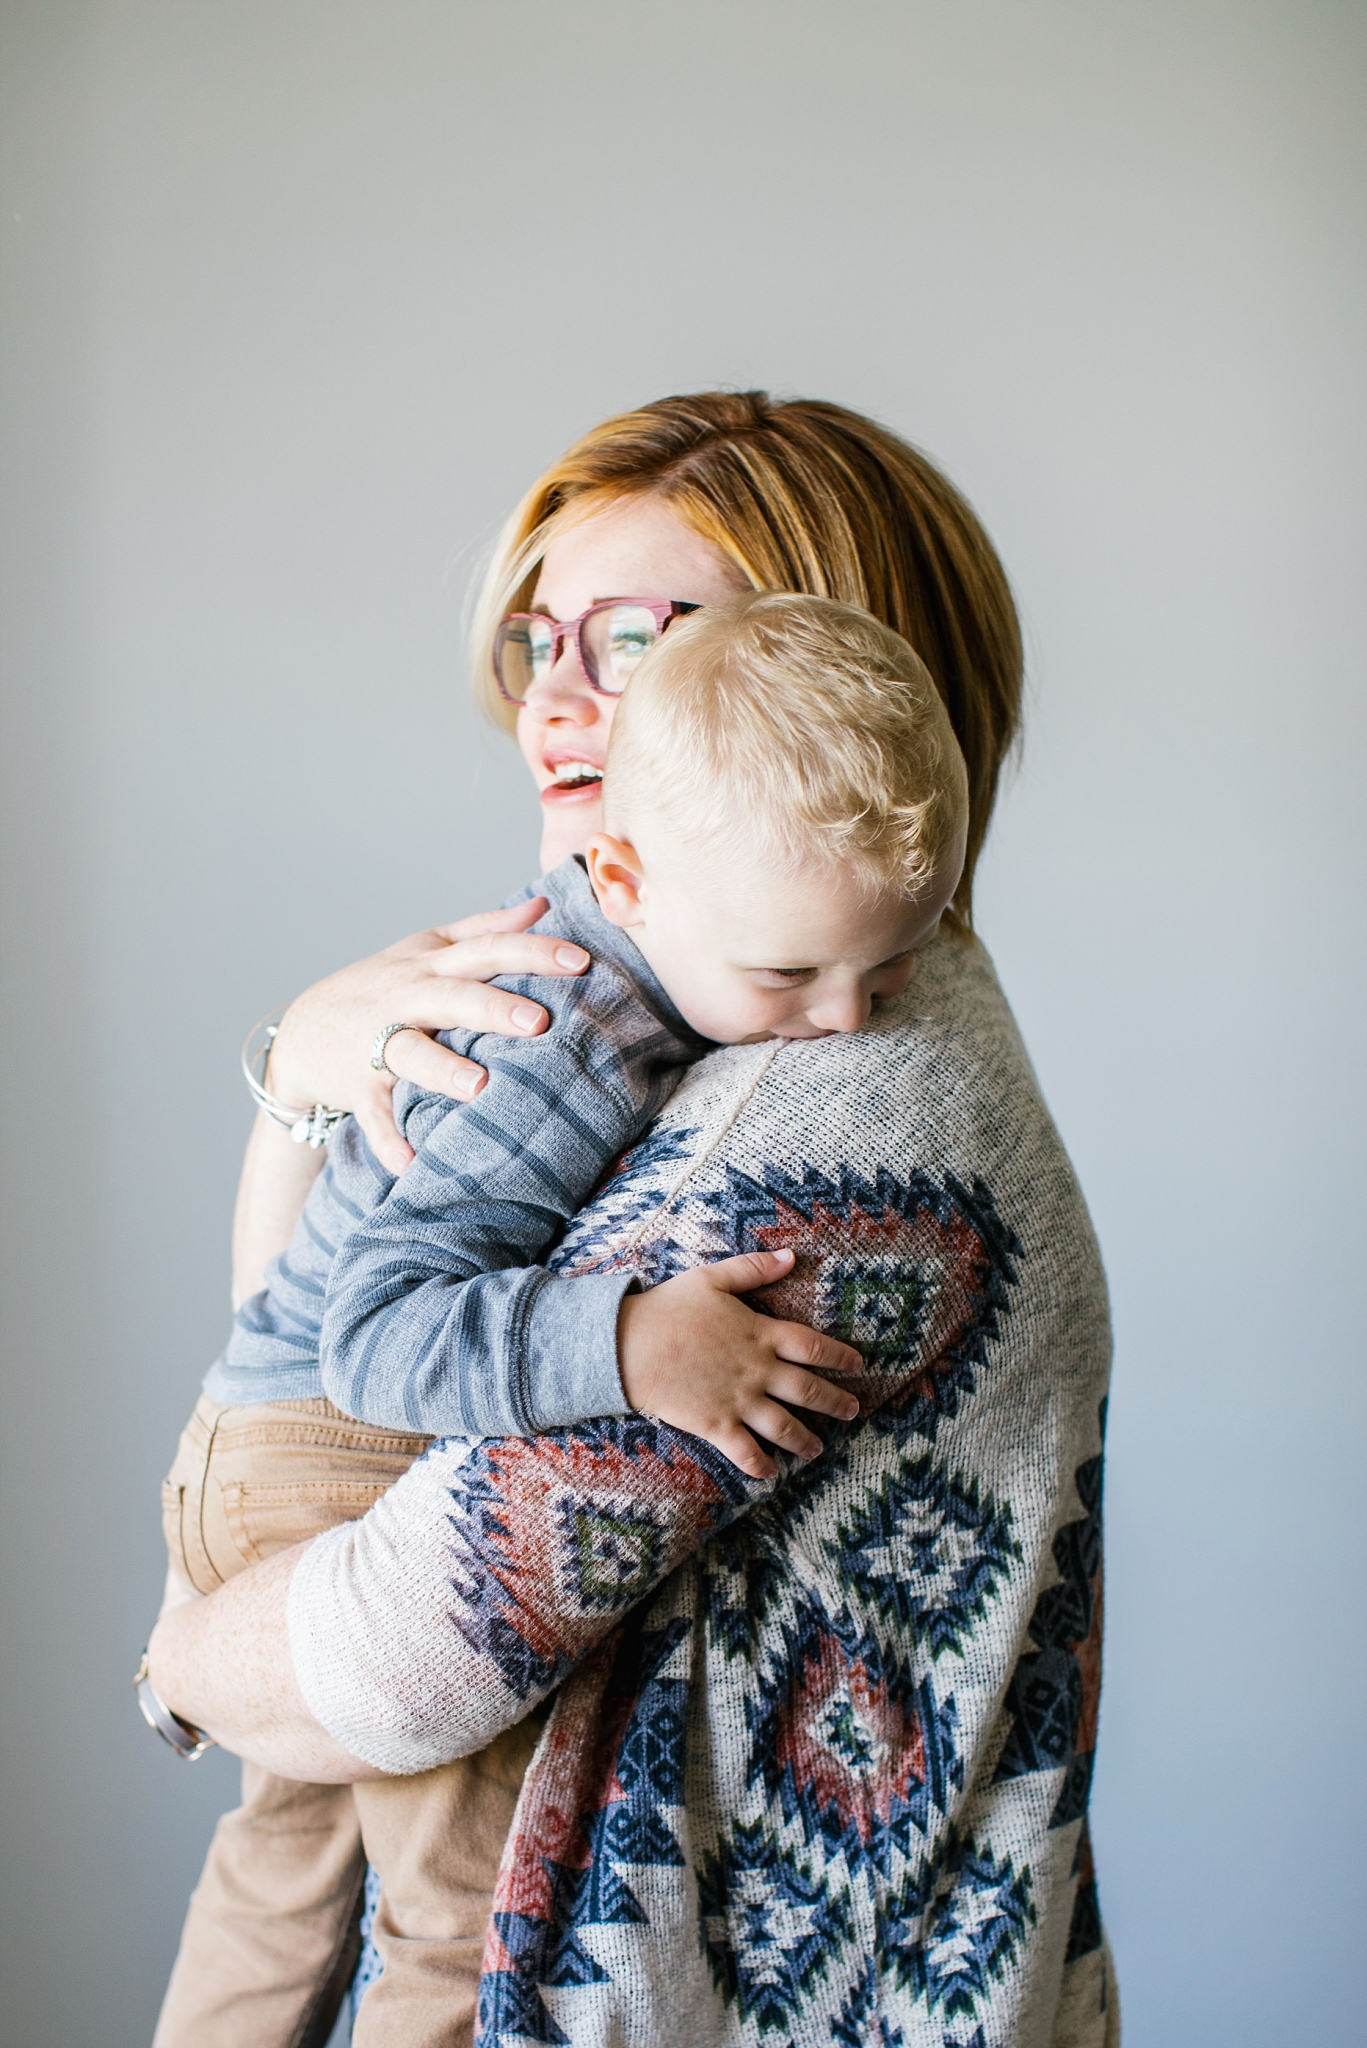 MommyandMe-66E_Lizzie-B-Imagery-Utah-Family-Photographer-Lifestyle-Photography-Salt-Lake-City-Park-City-Utah-County-Mommy-and-Me-Mini-Session-Studio.jpg